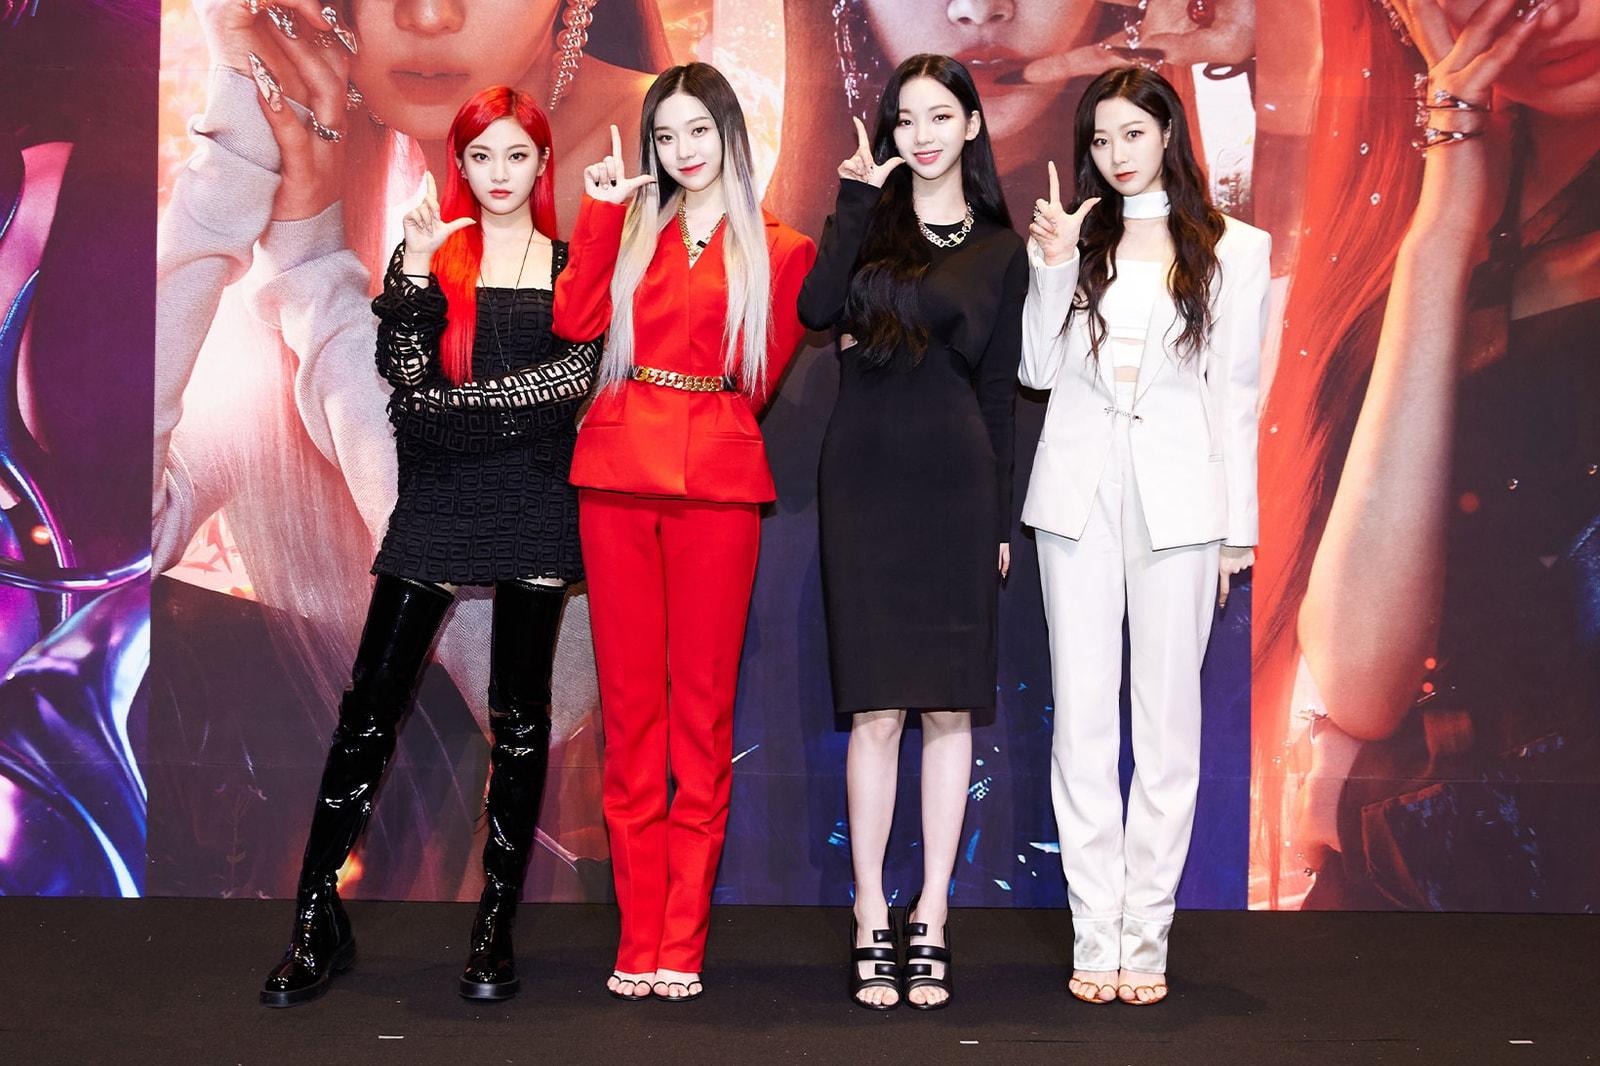 aespa next level single release press conference ningning karina winter giselle k-pop